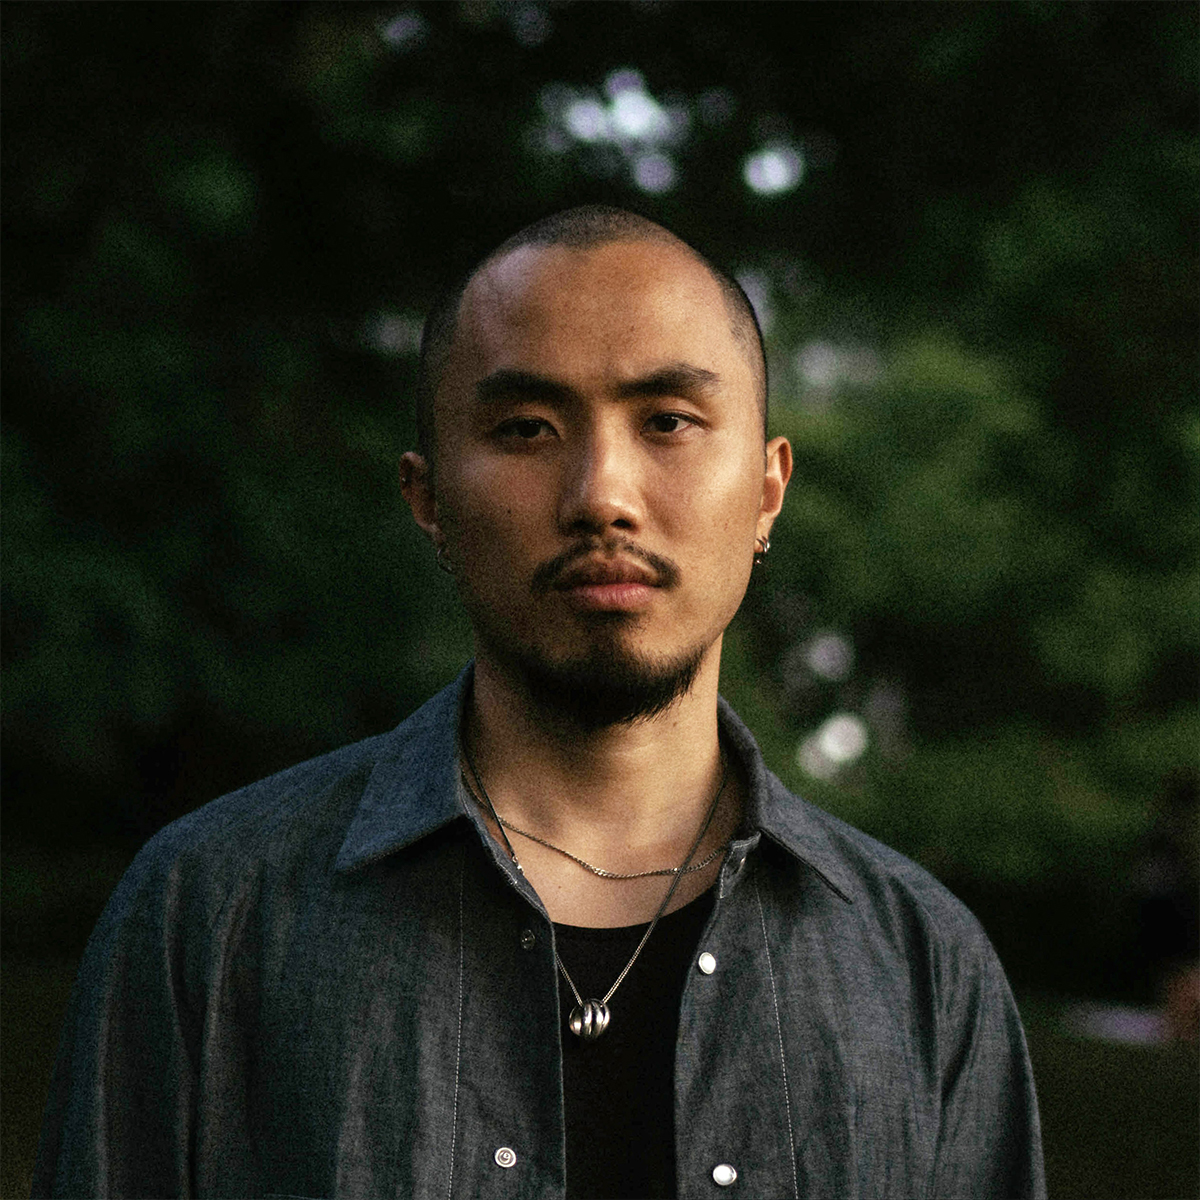 Illustrator Jeremy Leung